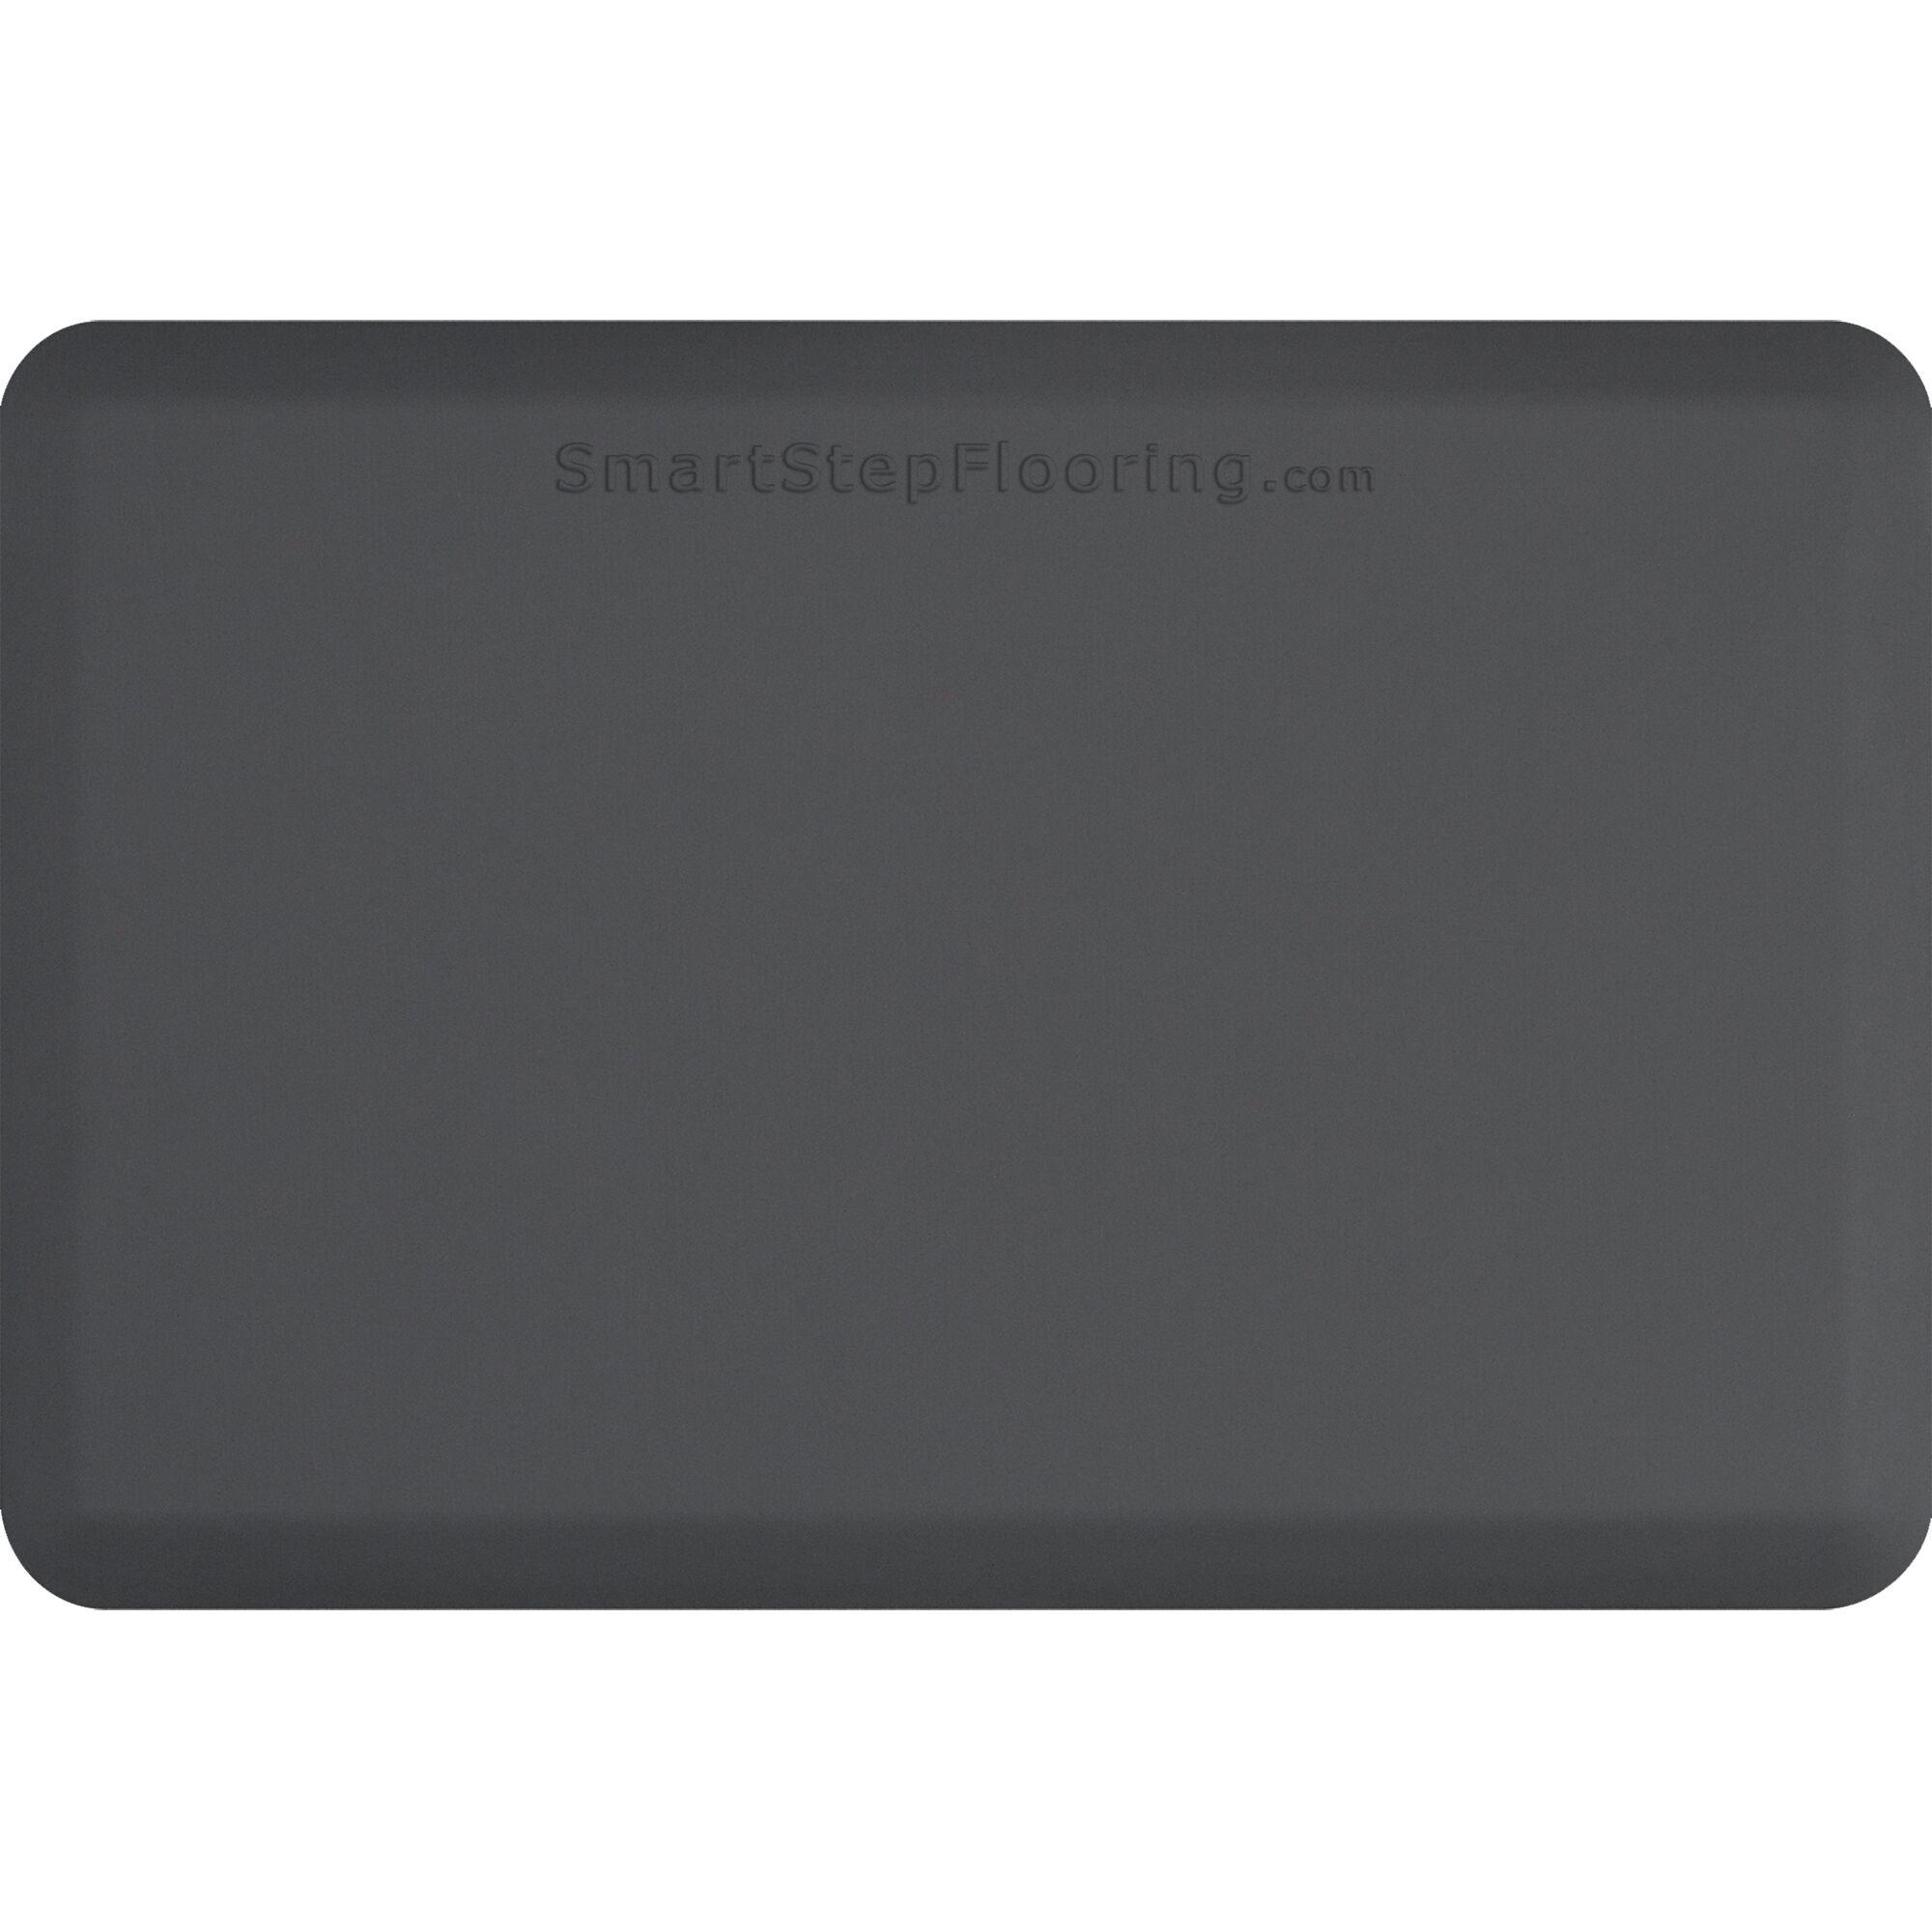 Kitchen Mat Mat Size: Rectangle 6' x 3', Color: Gray